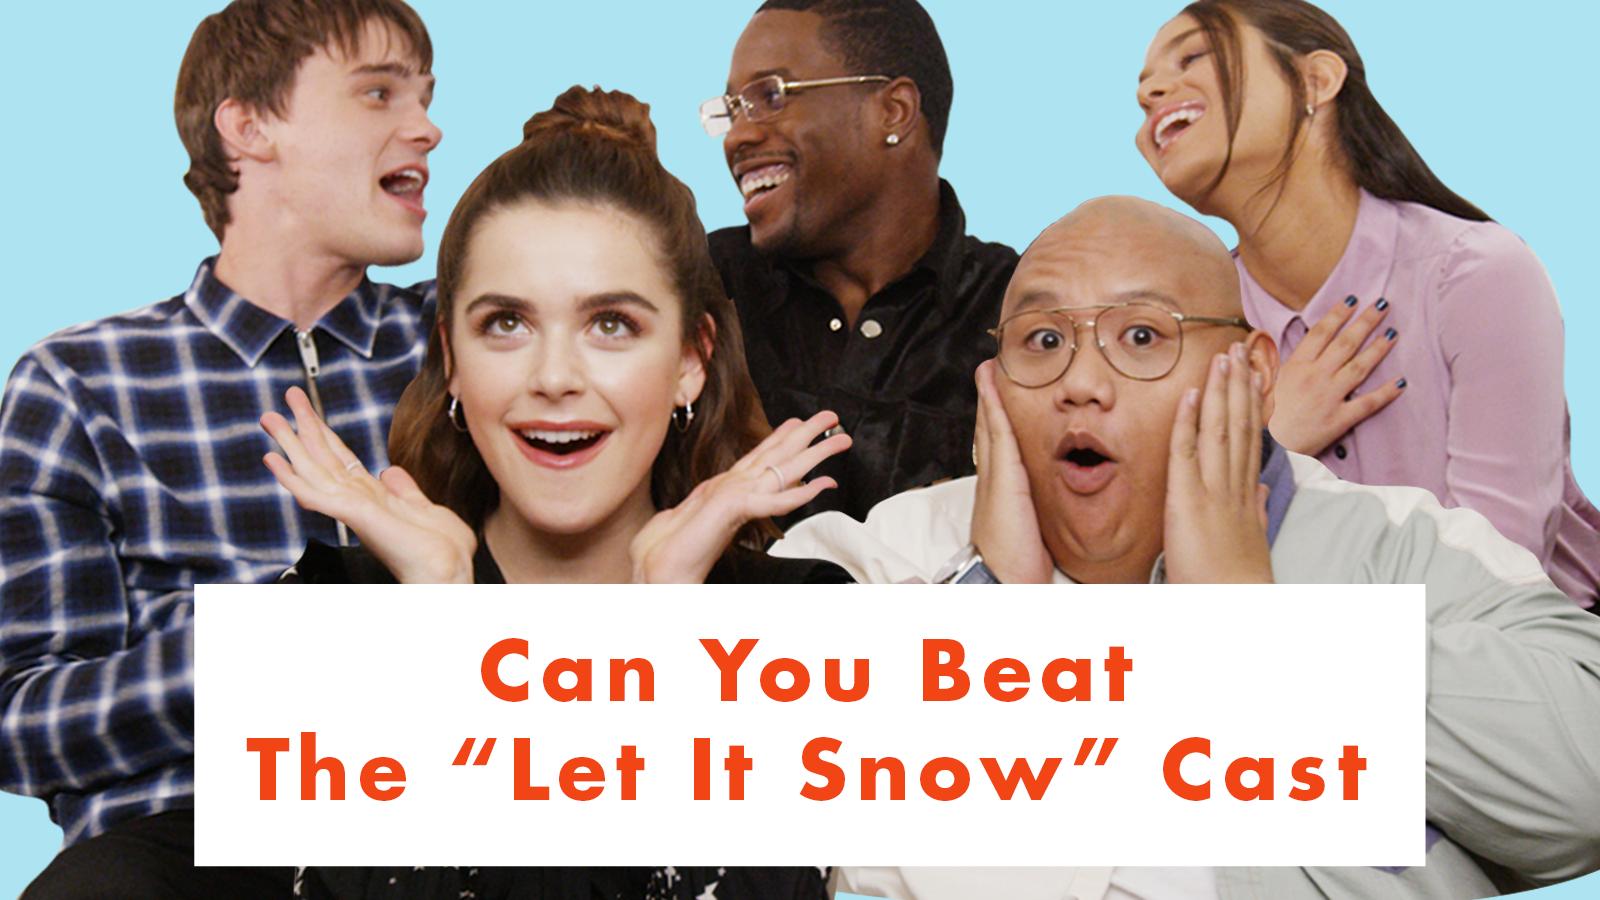 Watch Kiernan Shipka Crush Her 'Let It Snow' Castmates in Holiday Movie Trivia